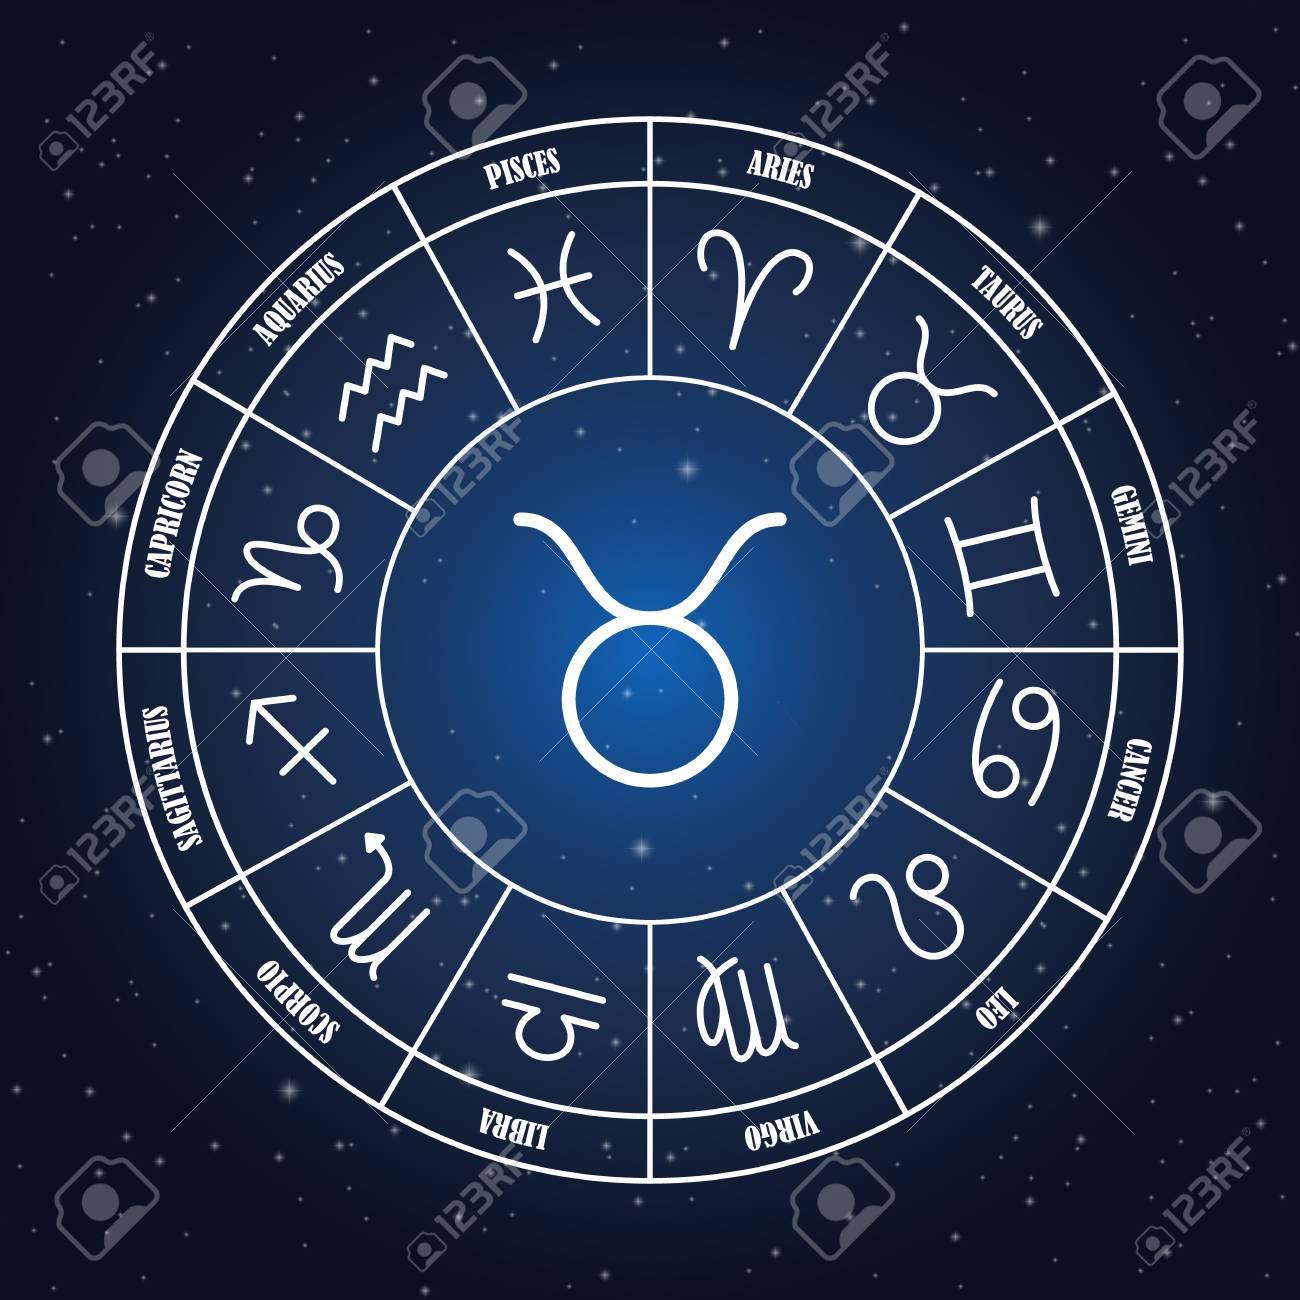 images astrology taurus